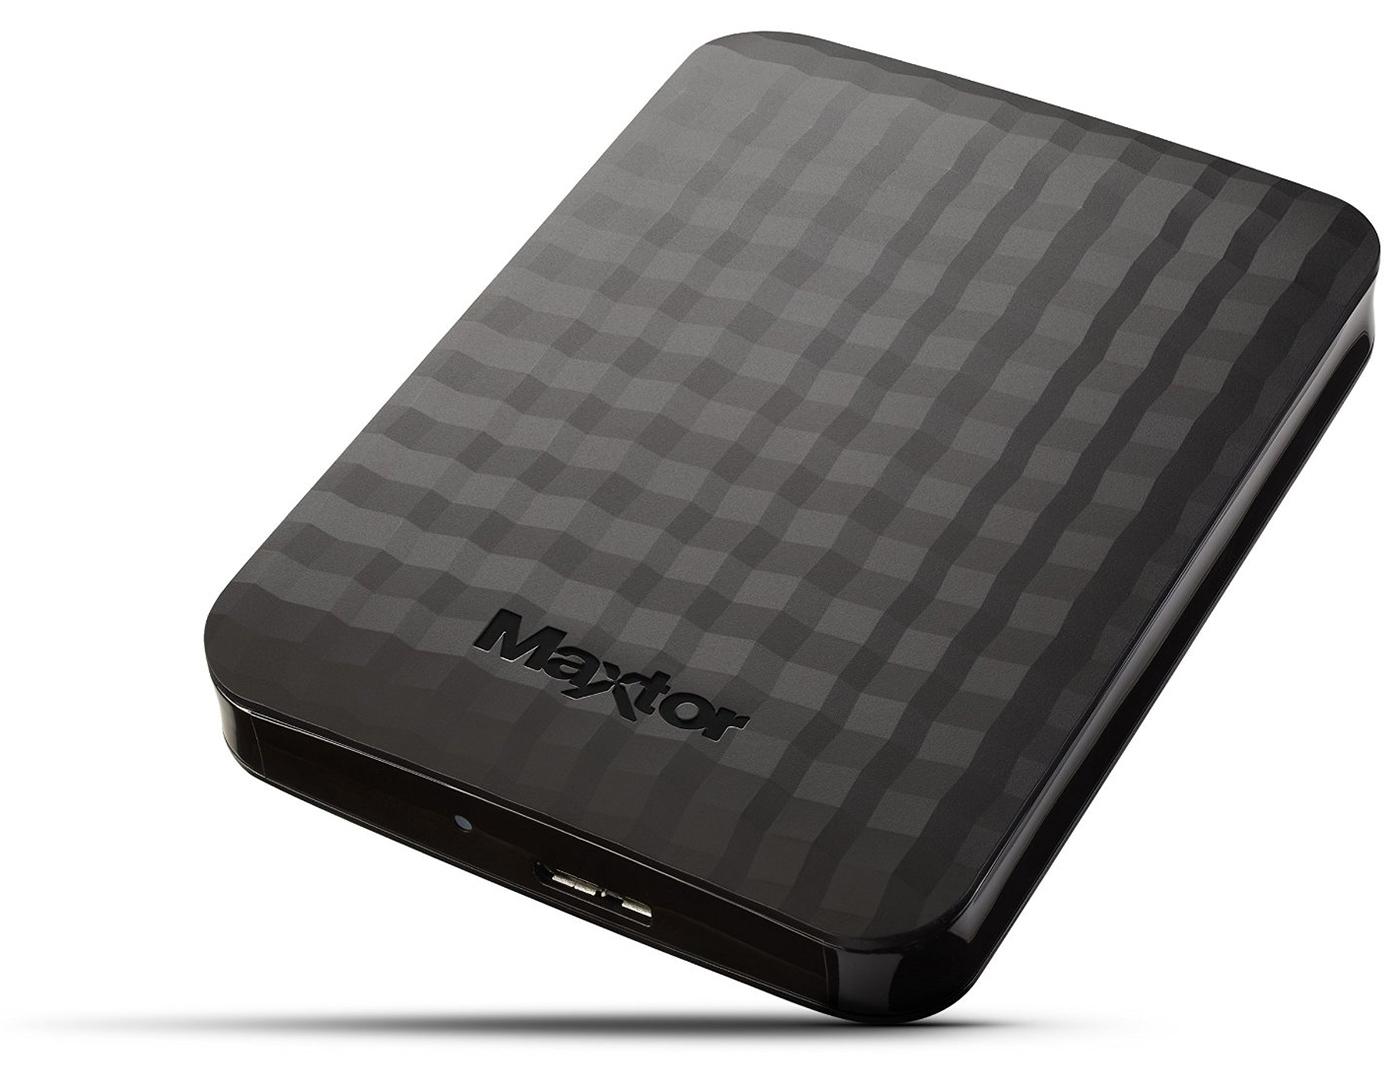 1tb Maxtor M3 Usb30 Slimline Portable Hard Drive Casing Hardisk Seagate Usb 30 25 Sata